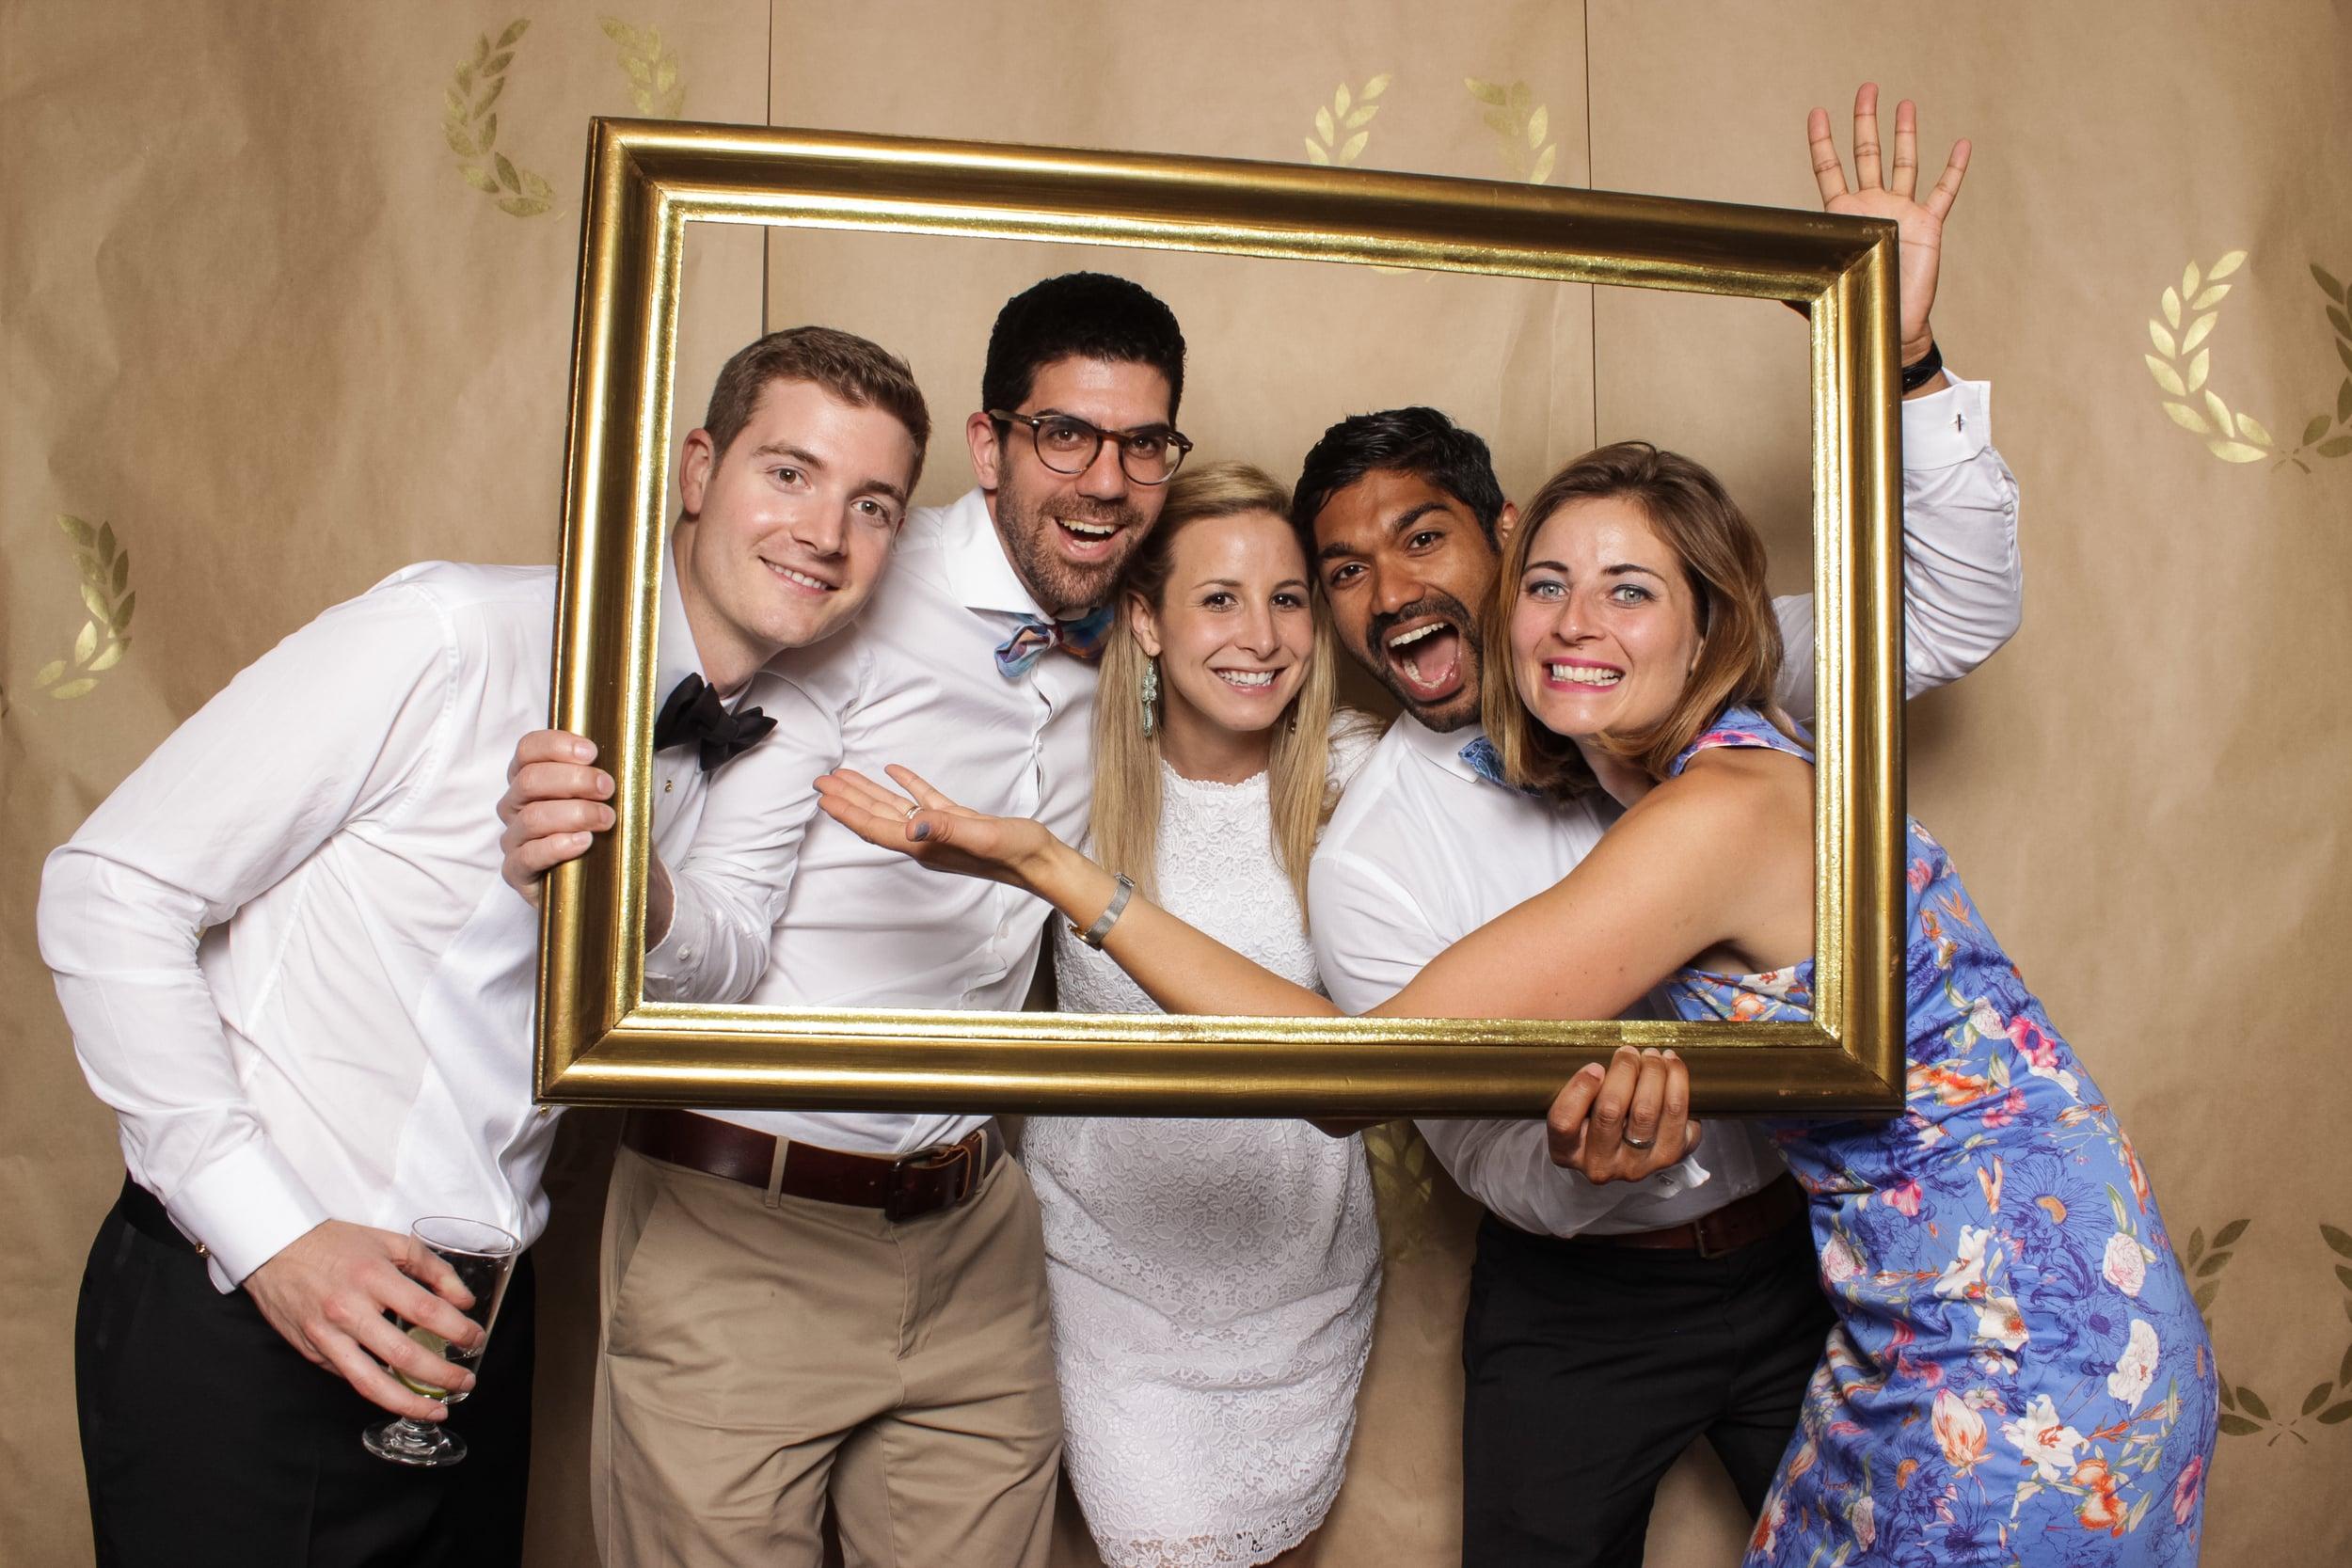 ottawa-wedding-photobooth-48.JPG